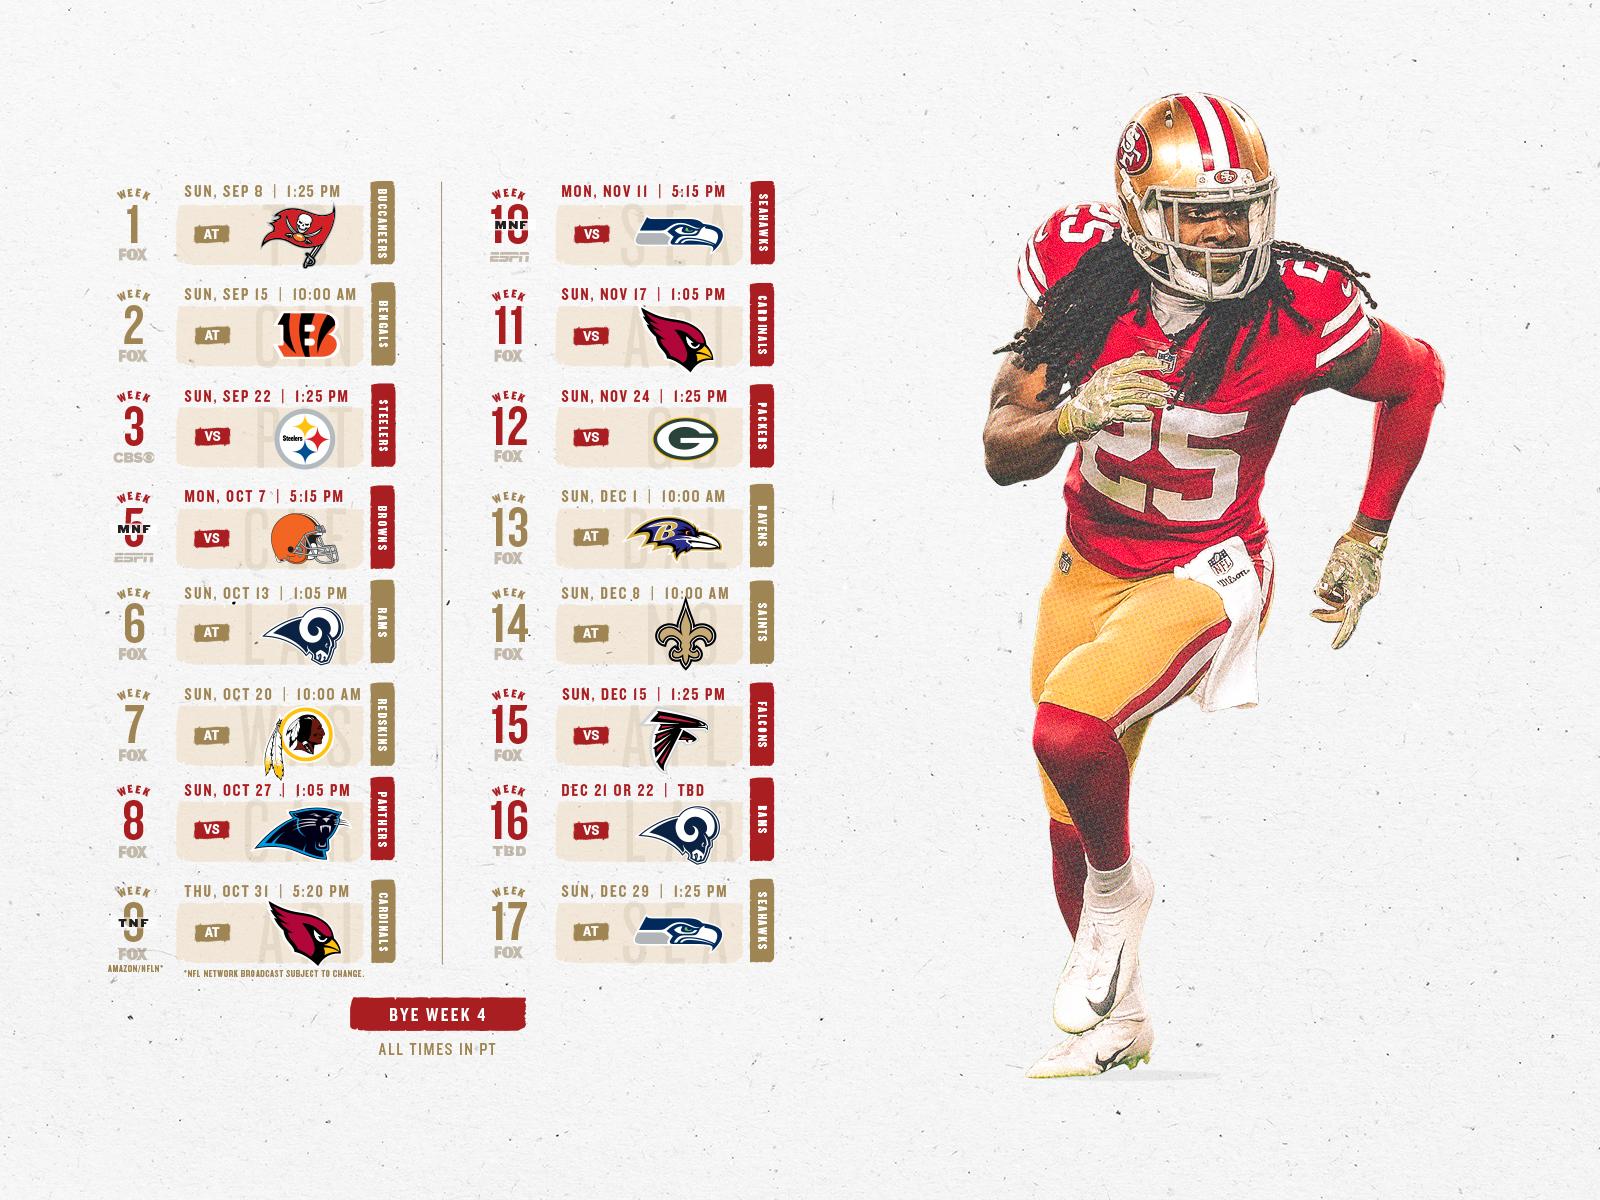 49ers fans san francisco 49ers - 2015 49ers schedule wallpaper ...